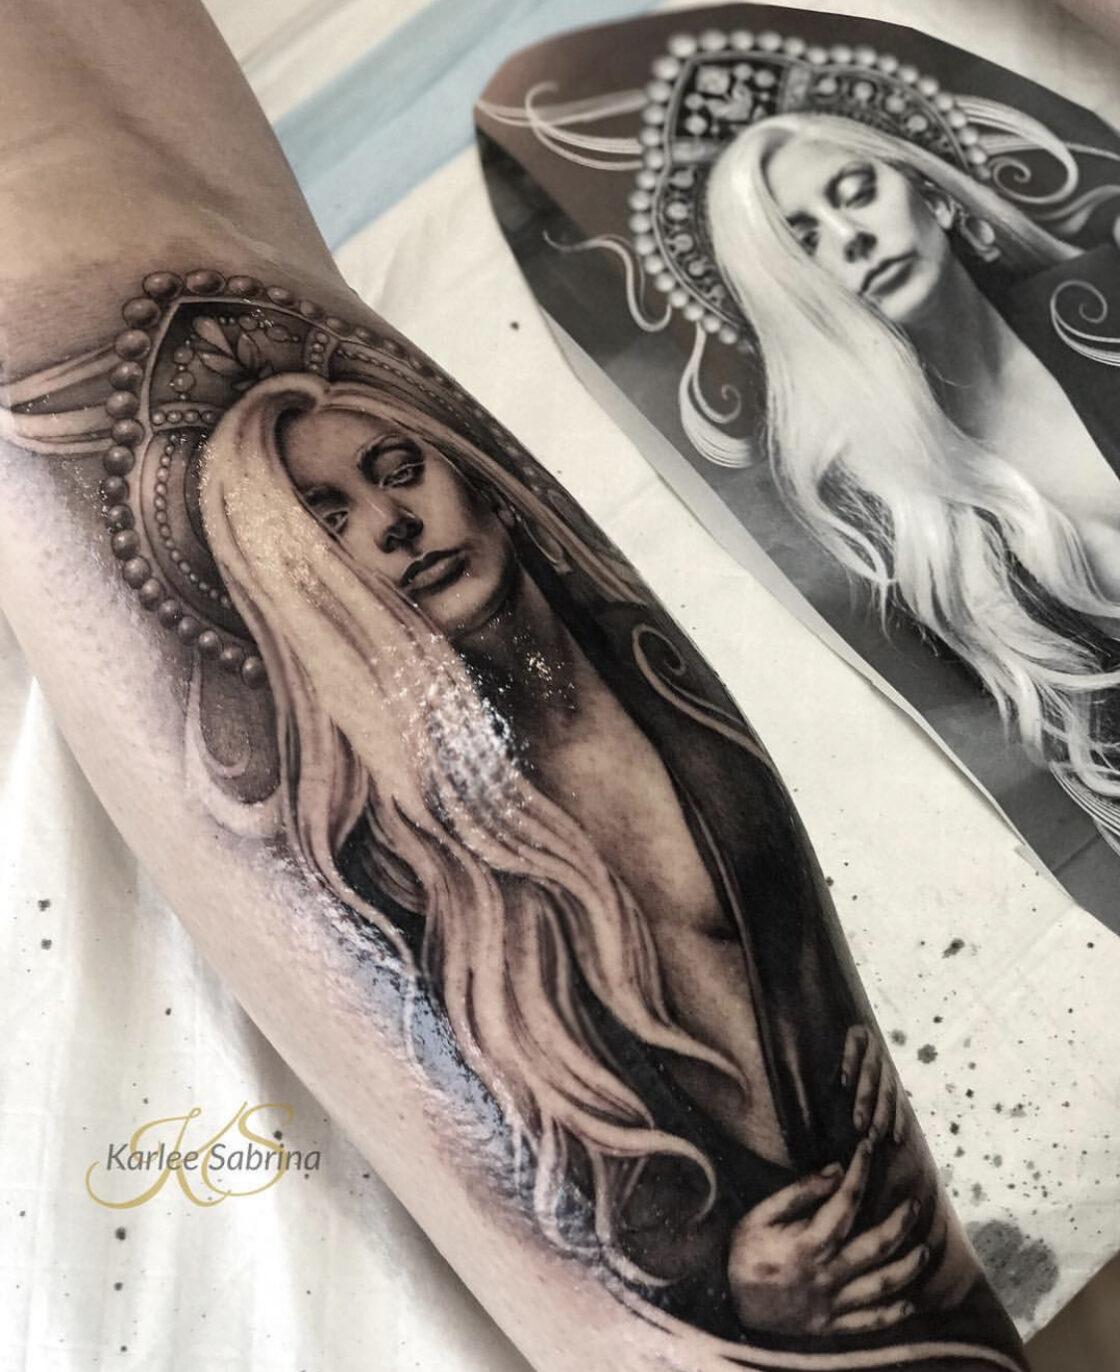 Karle Sabrina, Garage Ink, Gold Coast, Australia